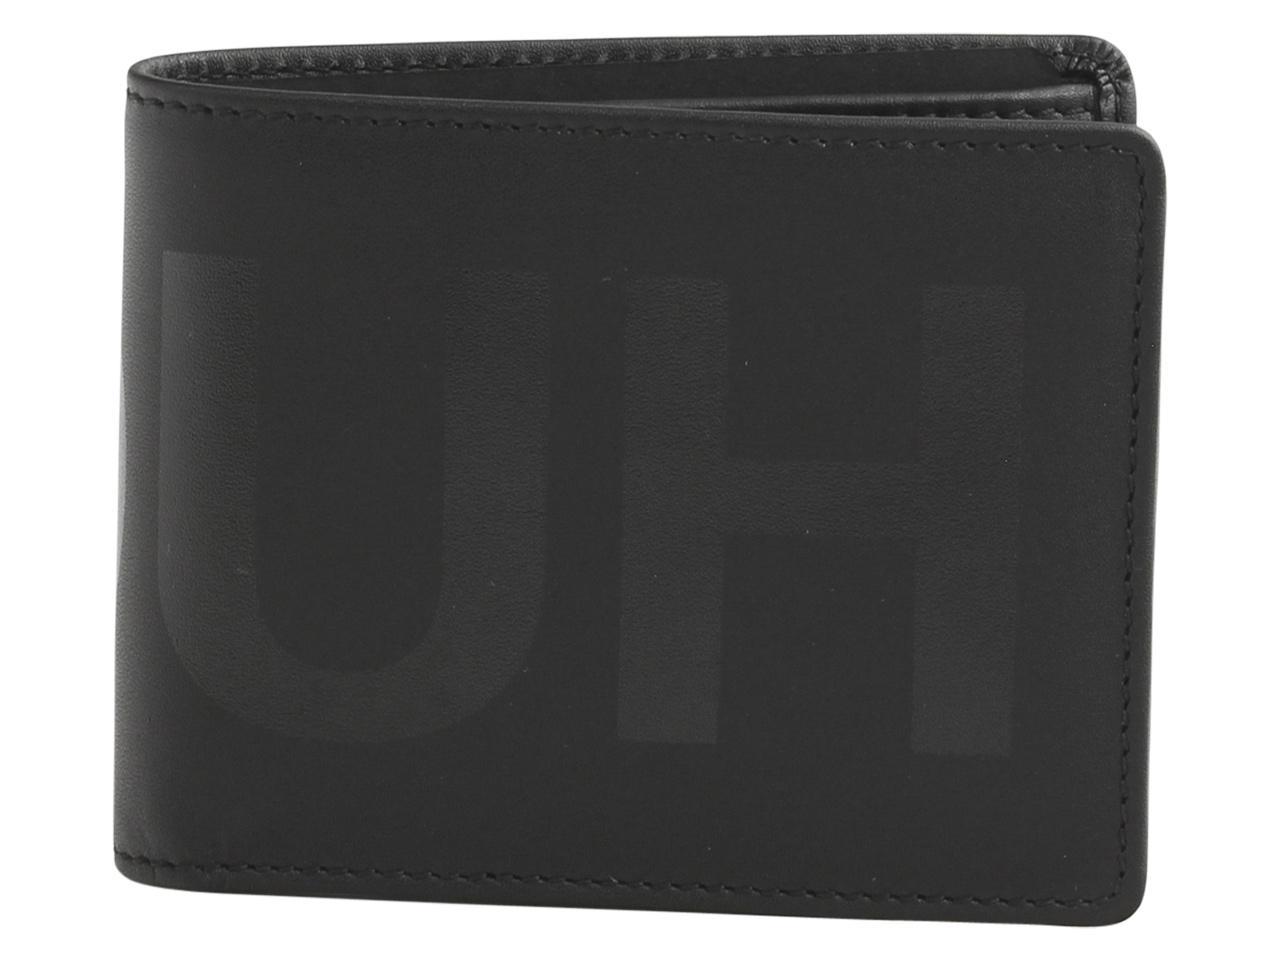 Hugo Boss Men's Statement Genuine Leather Wallet